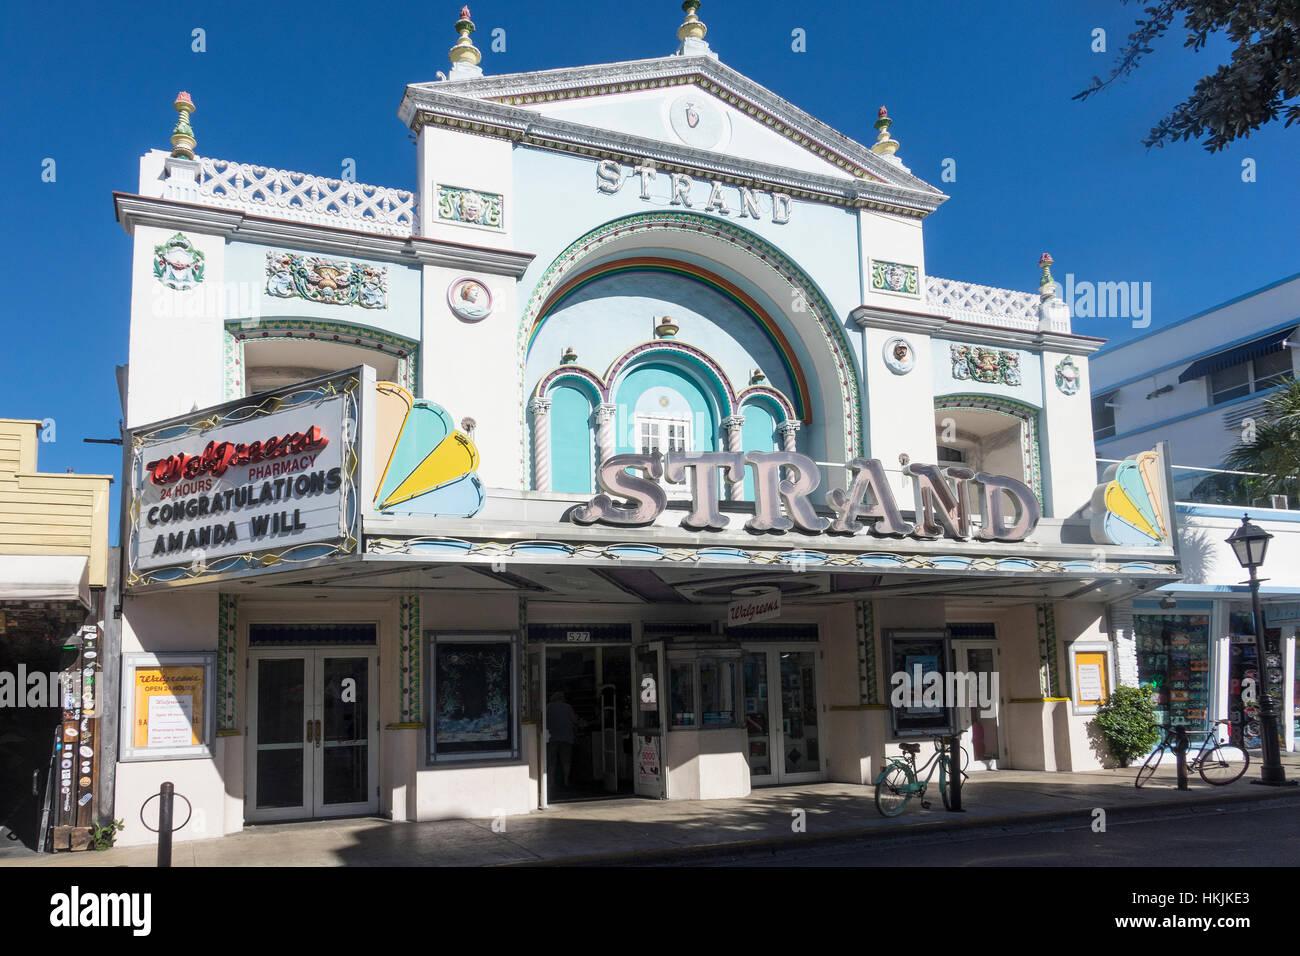 USA, Florida, Key West, Strand theater - Stock Image